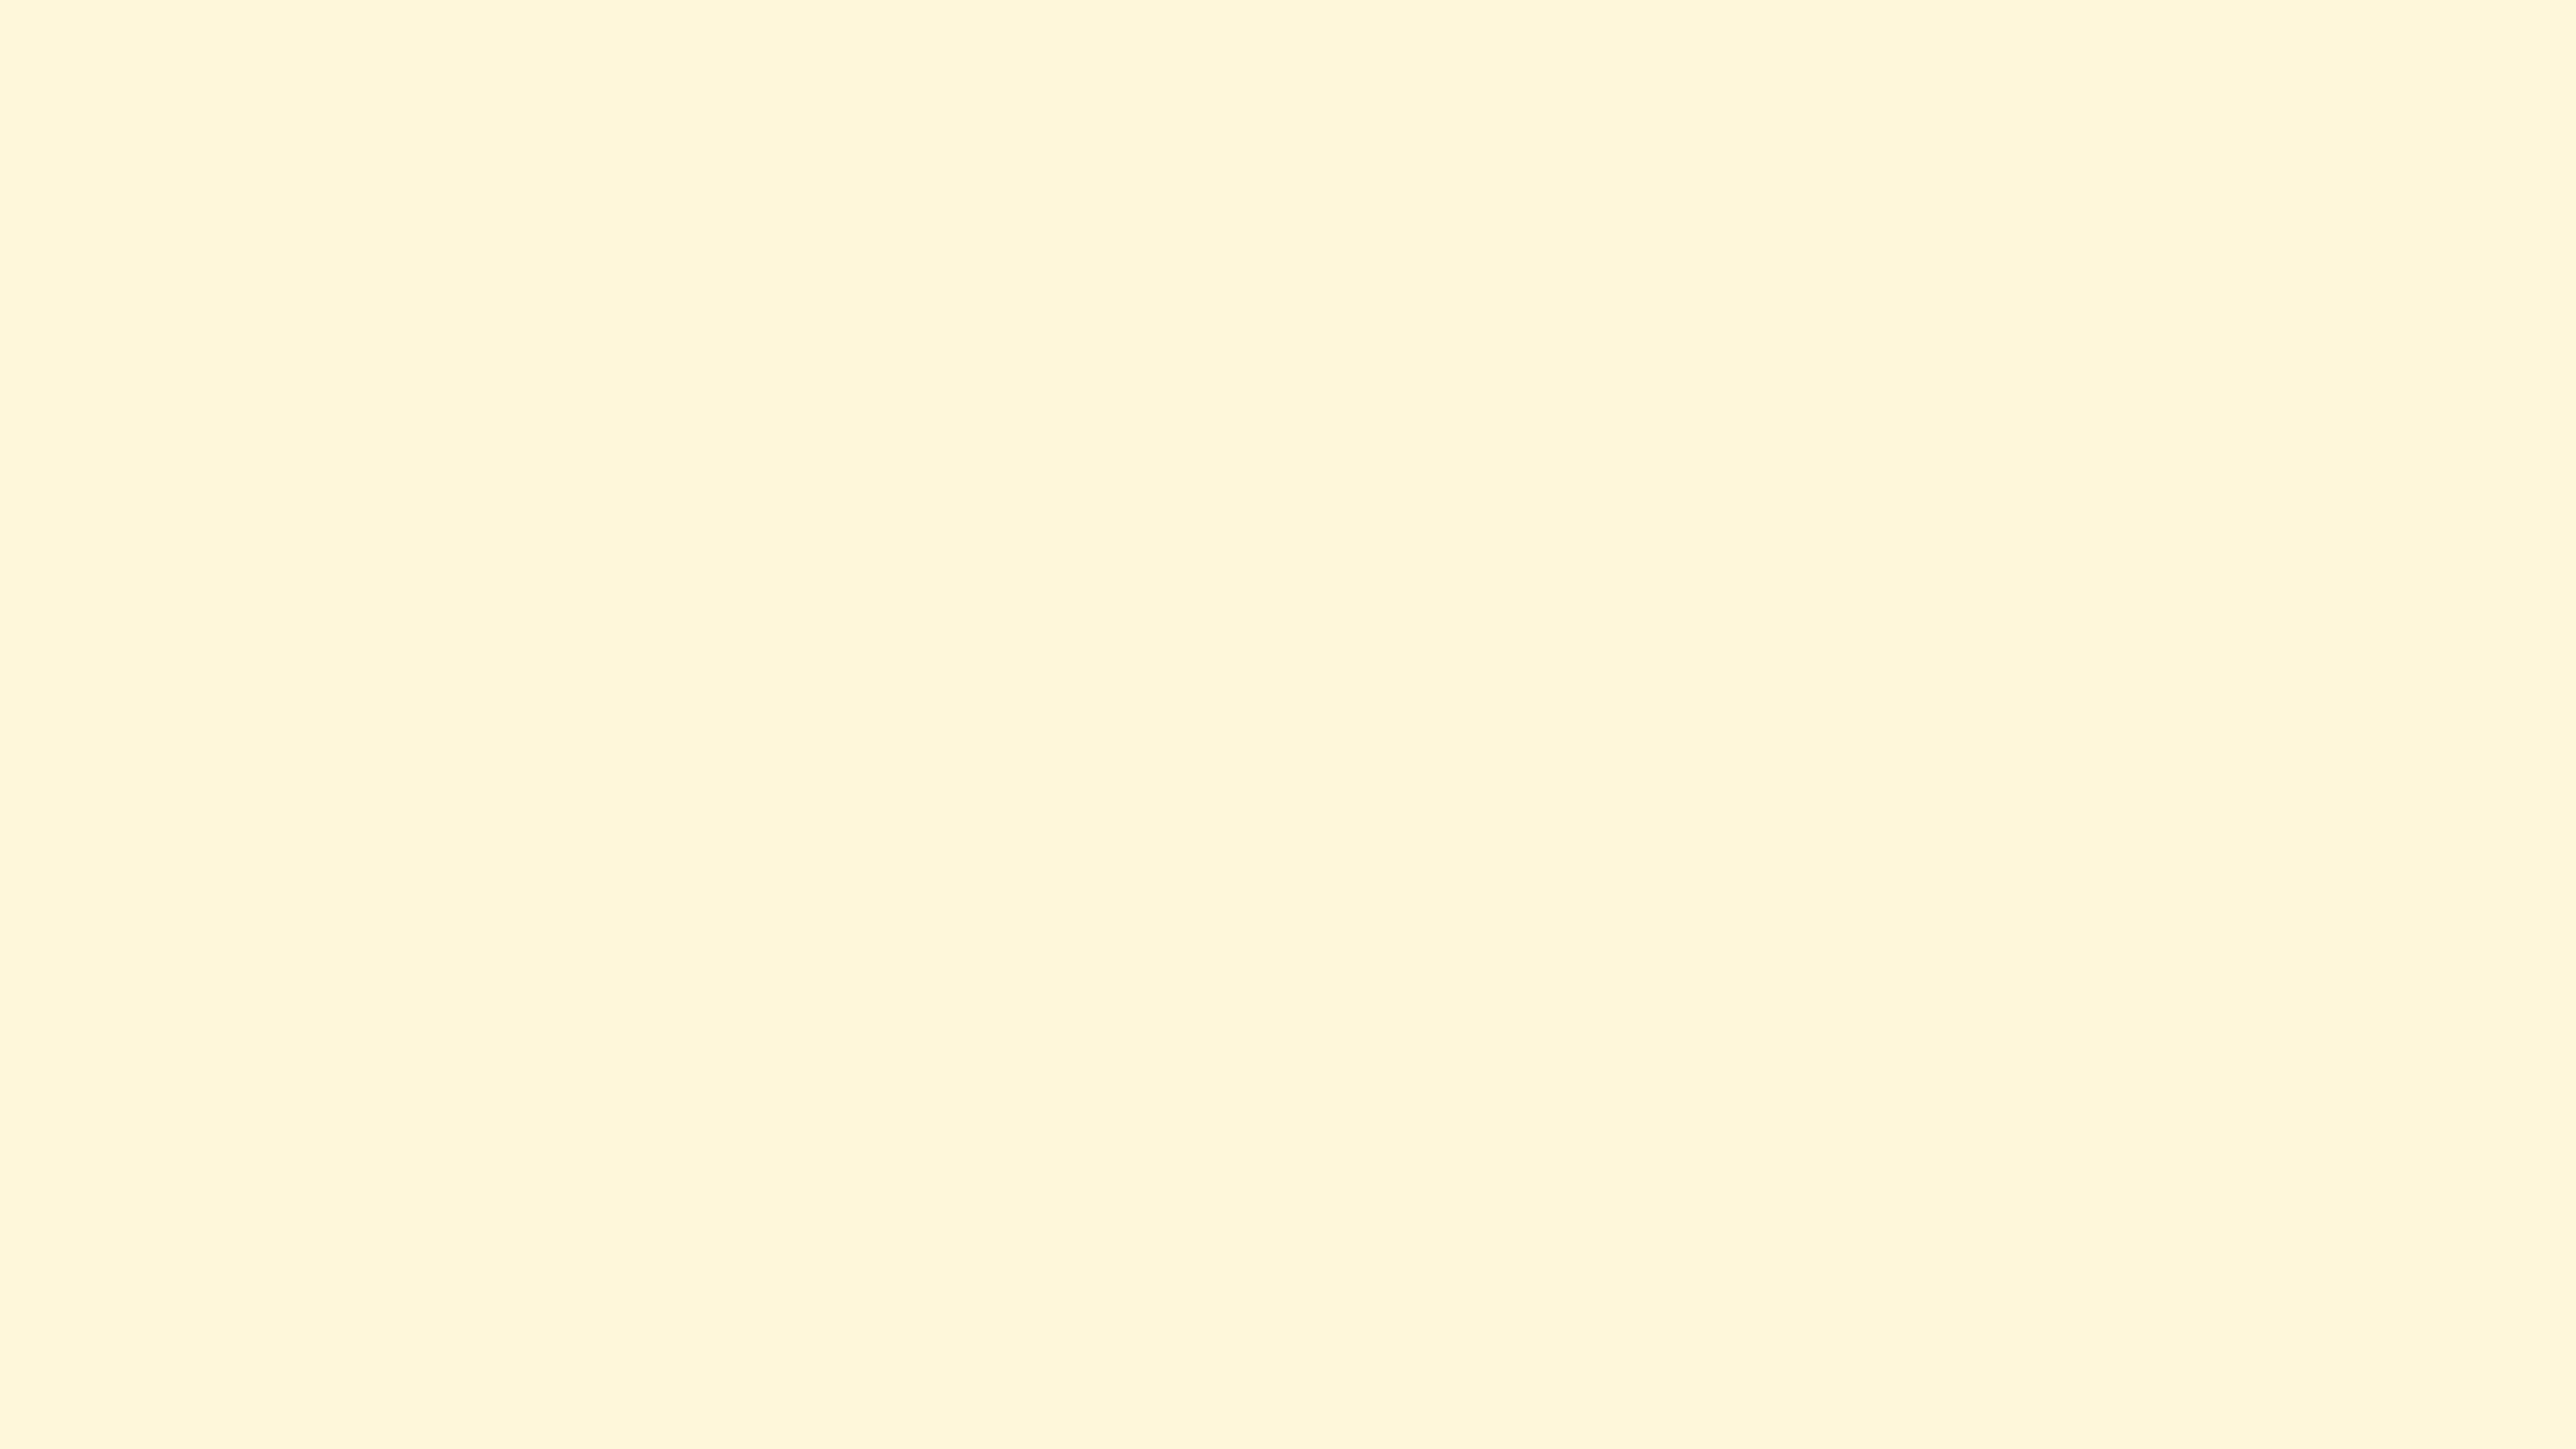 3840x2160 Cornsilk Solid Color Background